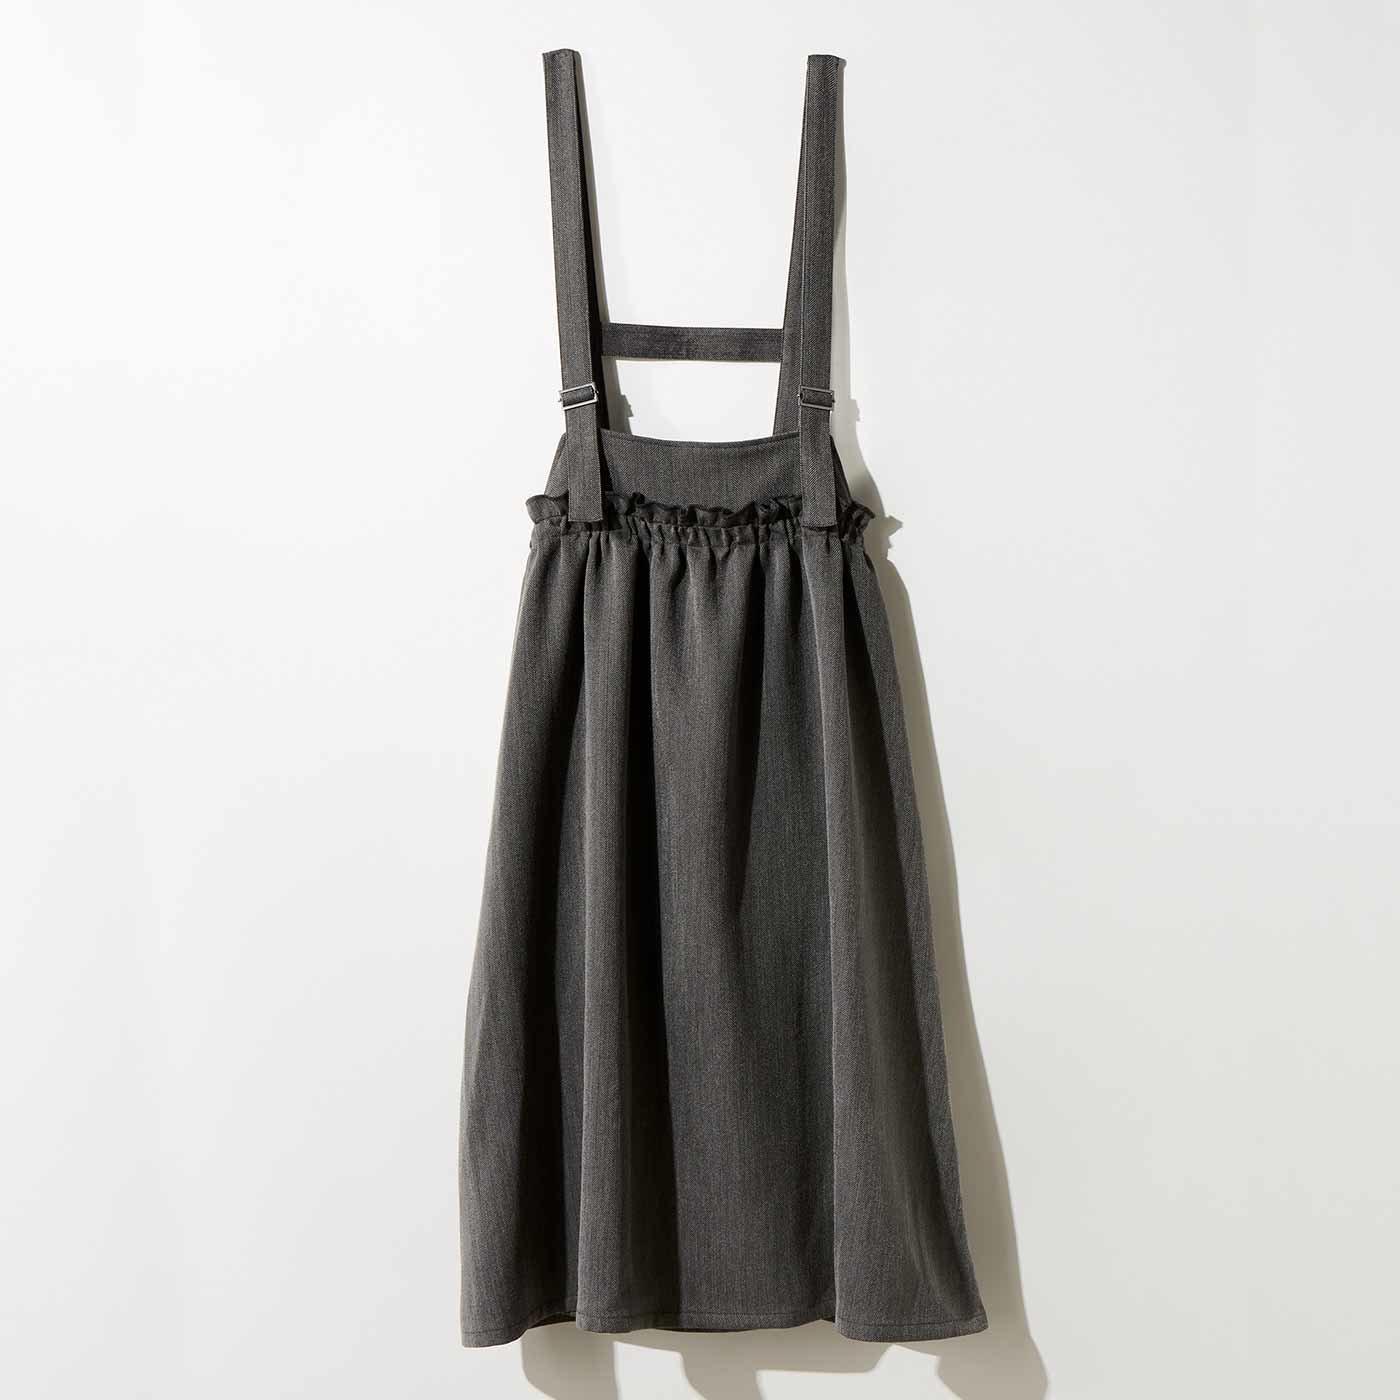 MEDE19F サスペンダー付きギャザースカート〈グレー〉